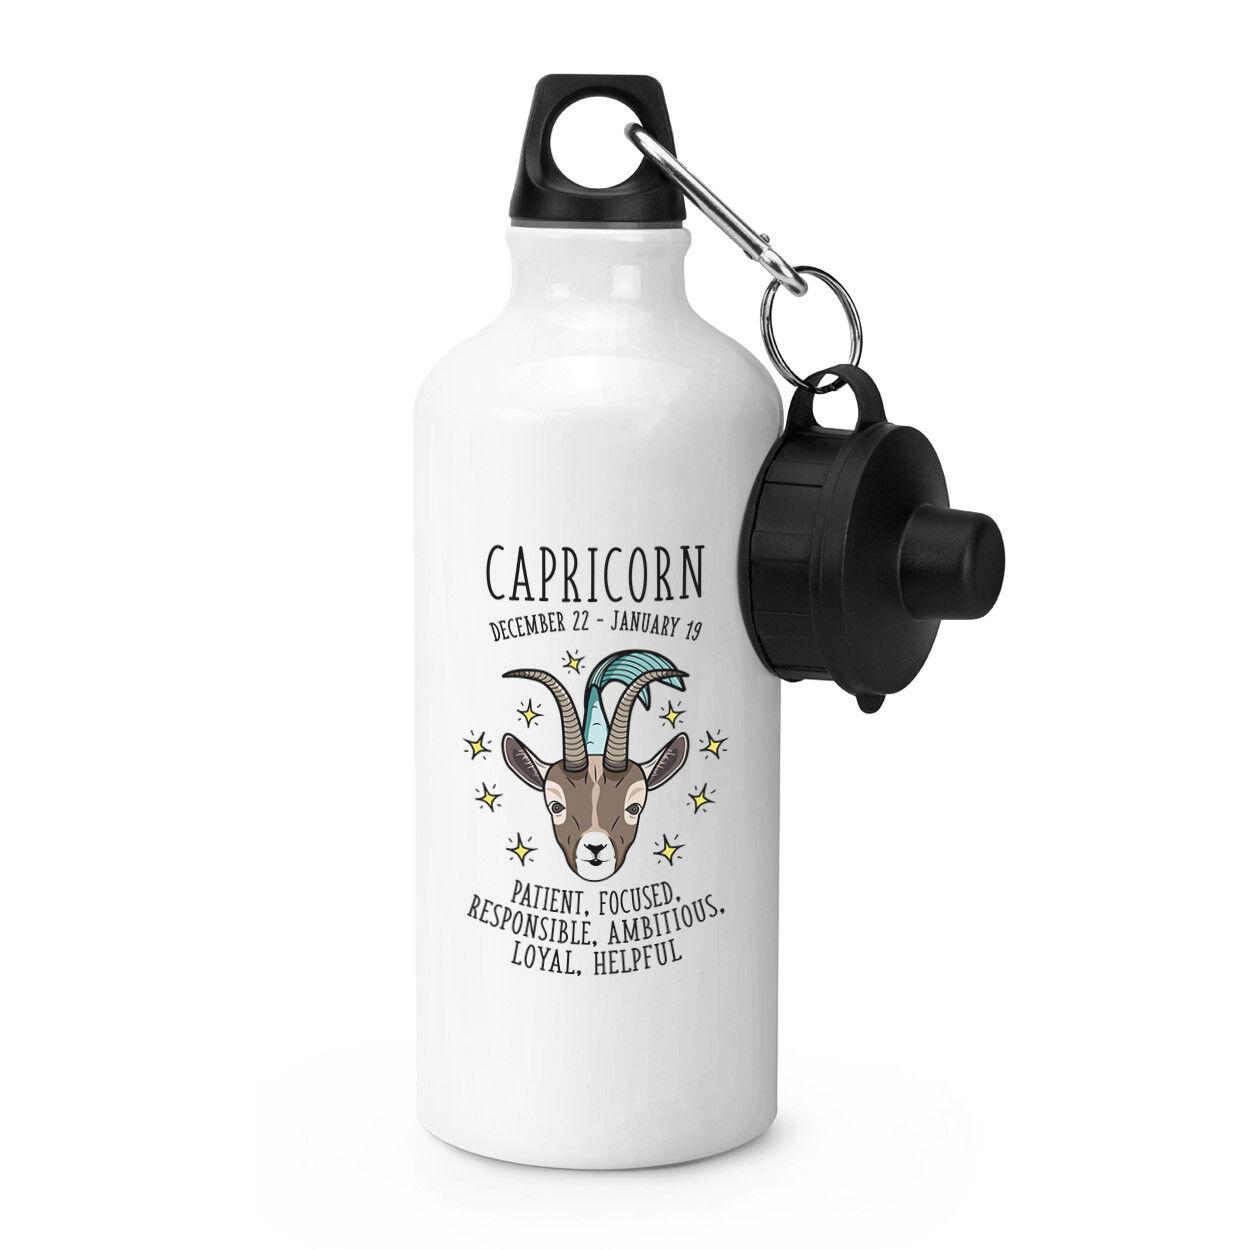 Capricorne Horoscope Sport Sport Sport Bouteille Boisson Camping Flasque - étoile insigne 3c5375